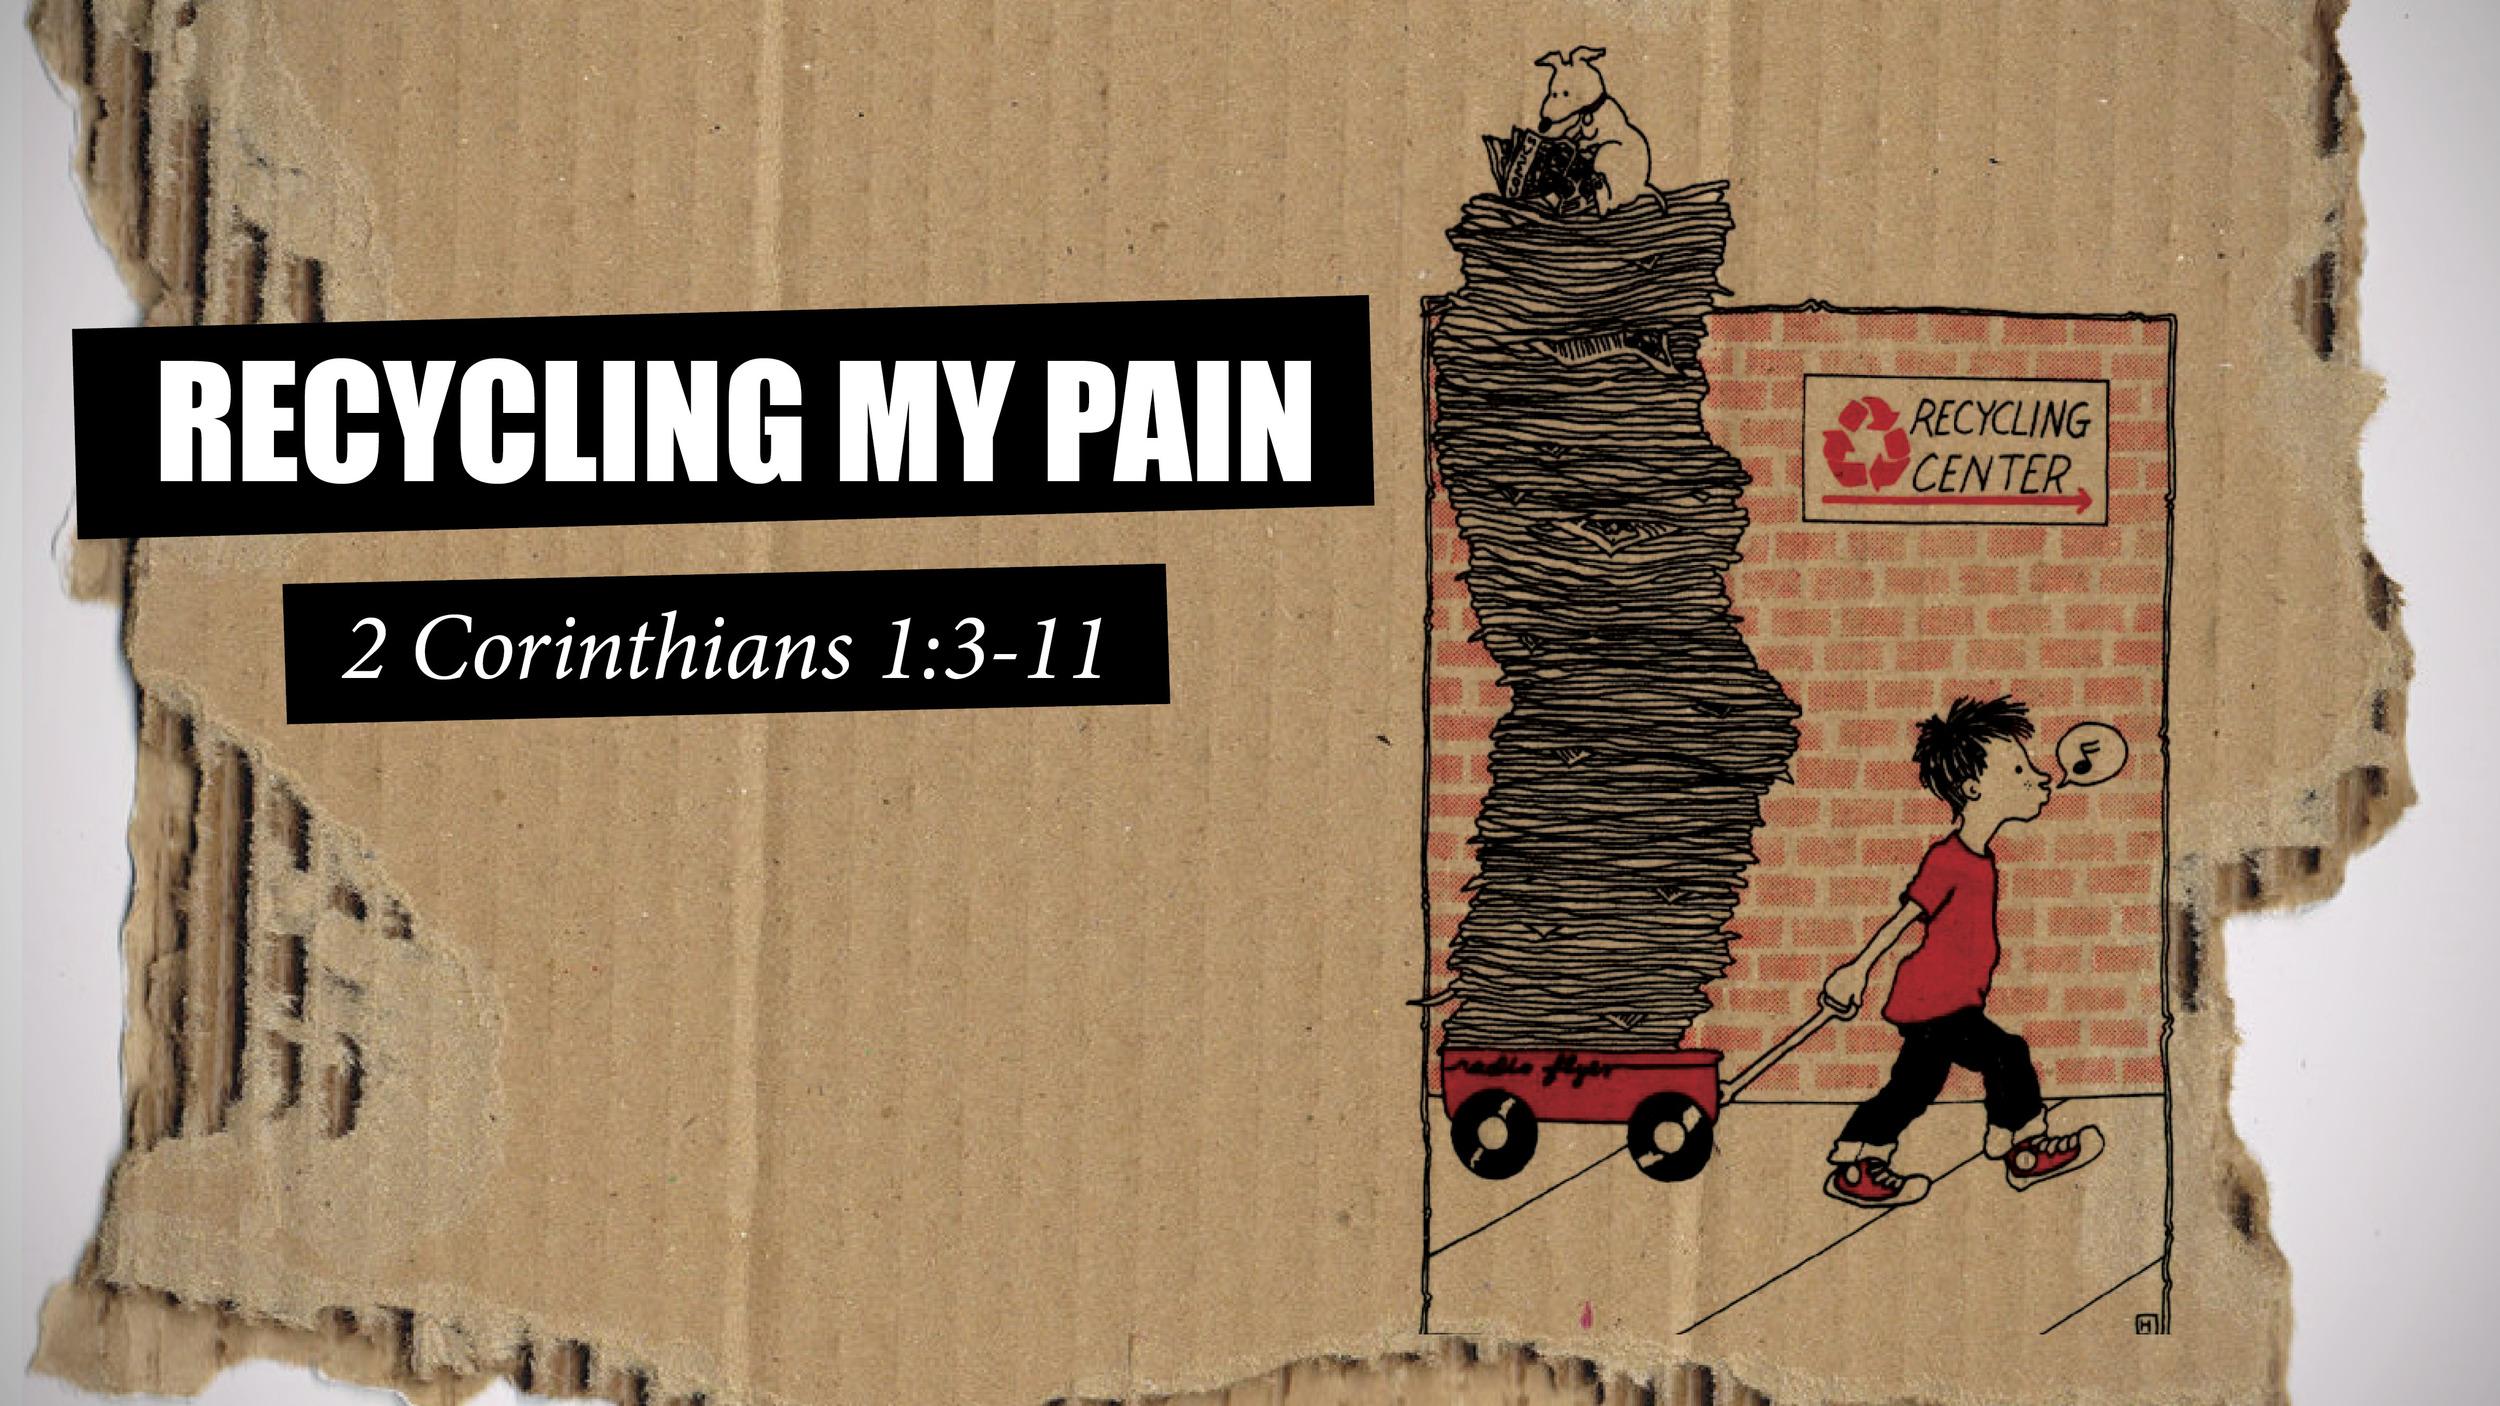 11.10.13 recycling my pain.jpg